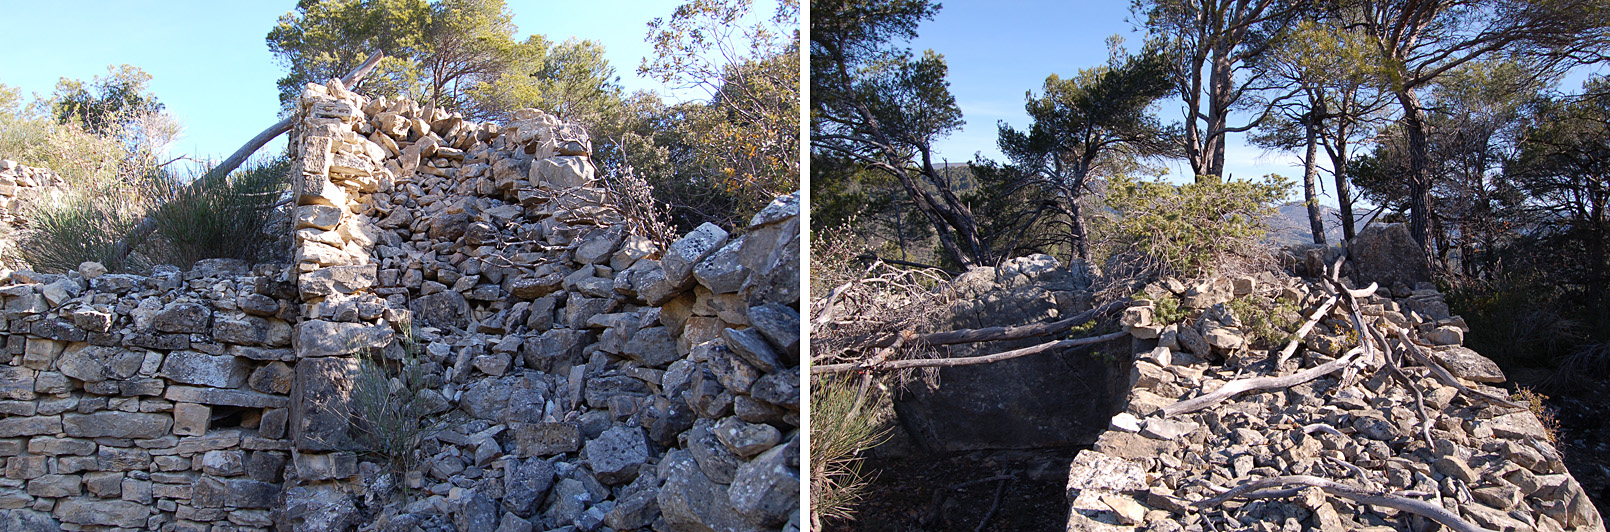 Murs actuels 3-4